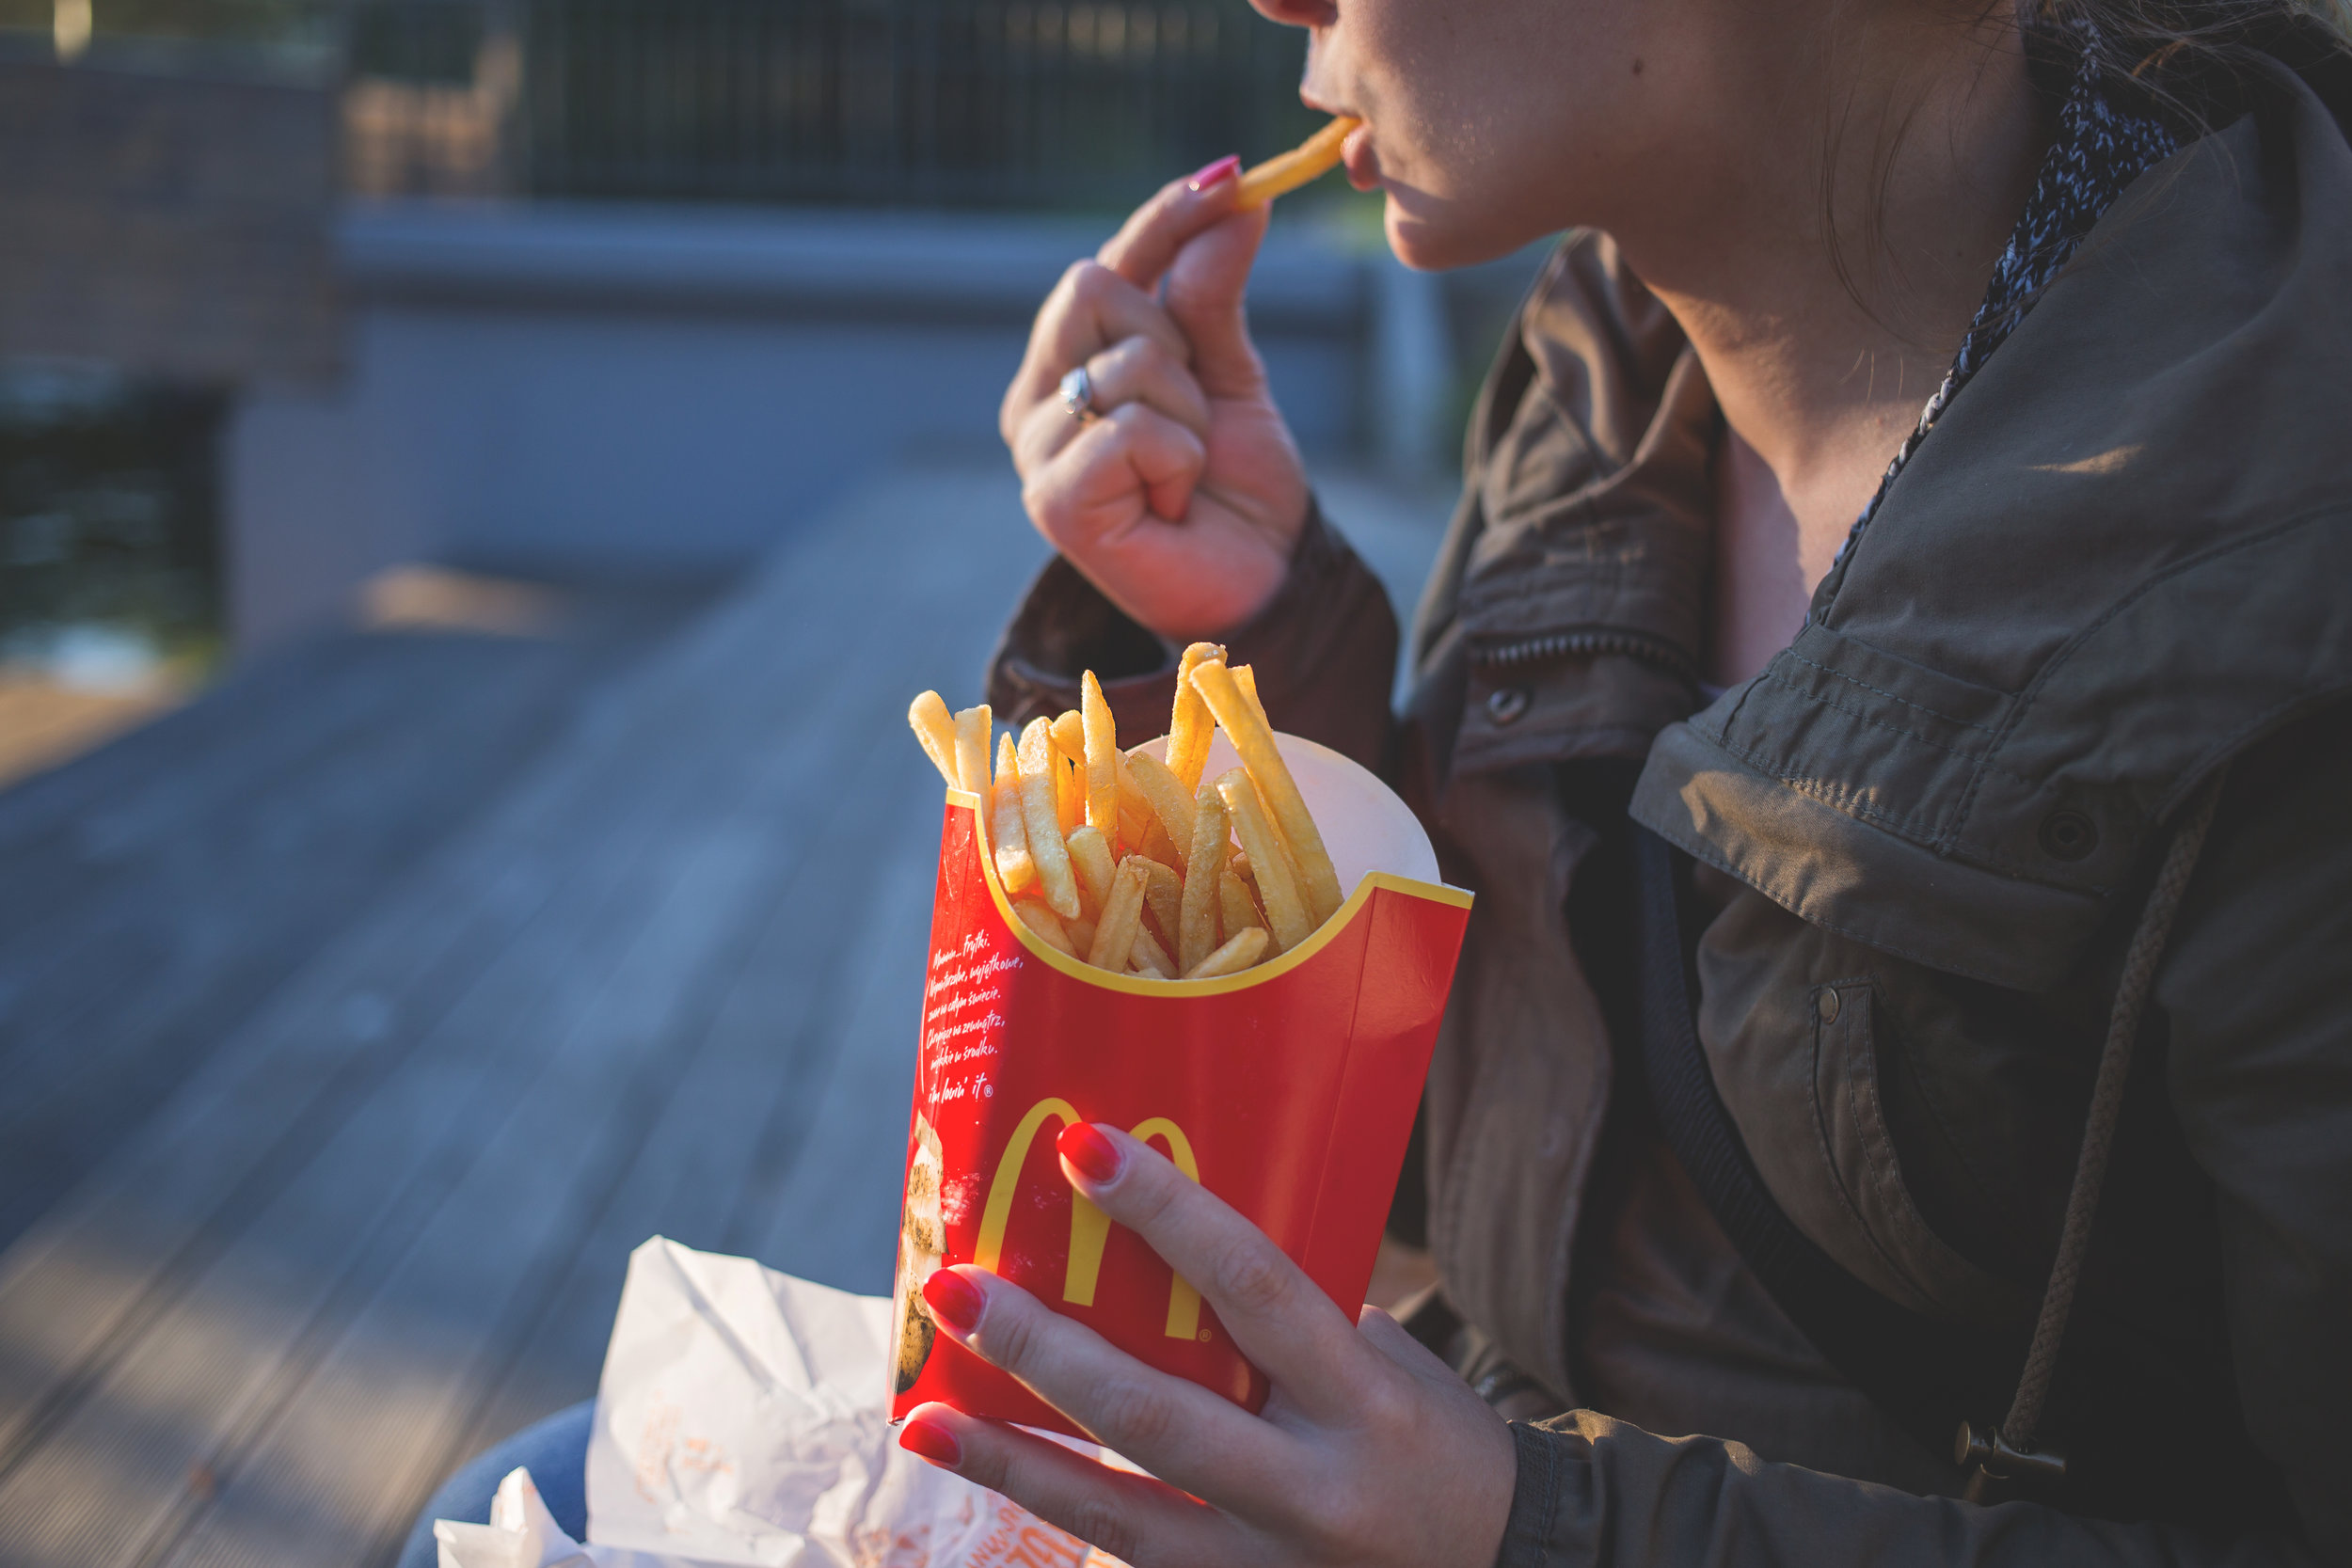 Salt and fast foods